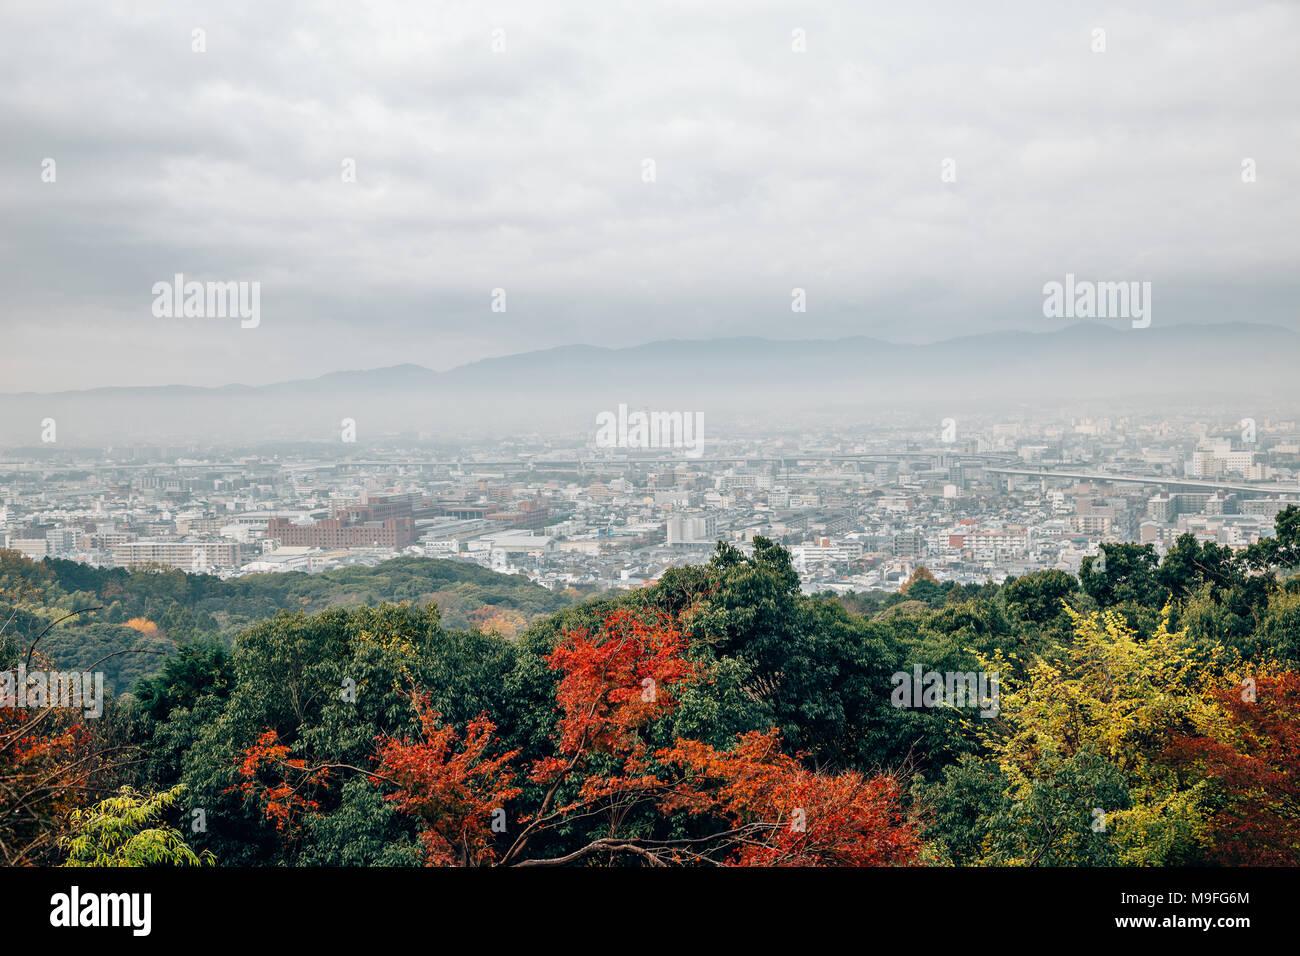 Kyoto city and autumn maple view under cloudy sky at Fushimi Inari shrine in Kyoto, Japan Stock Photo